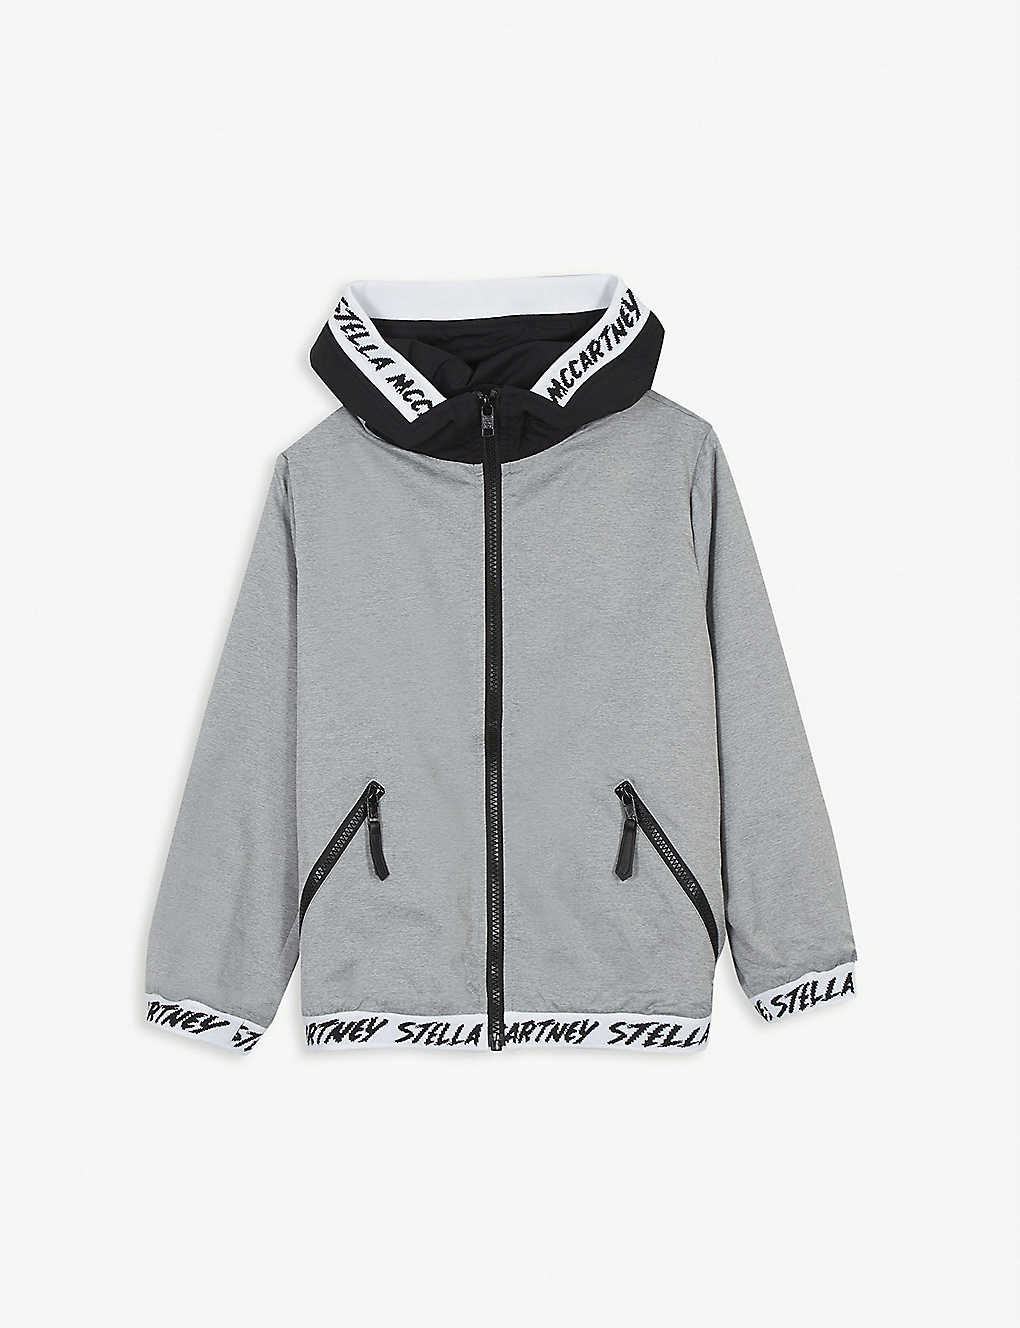 Stella Mccartney Coats Water repellent logo jacket 4-15 years